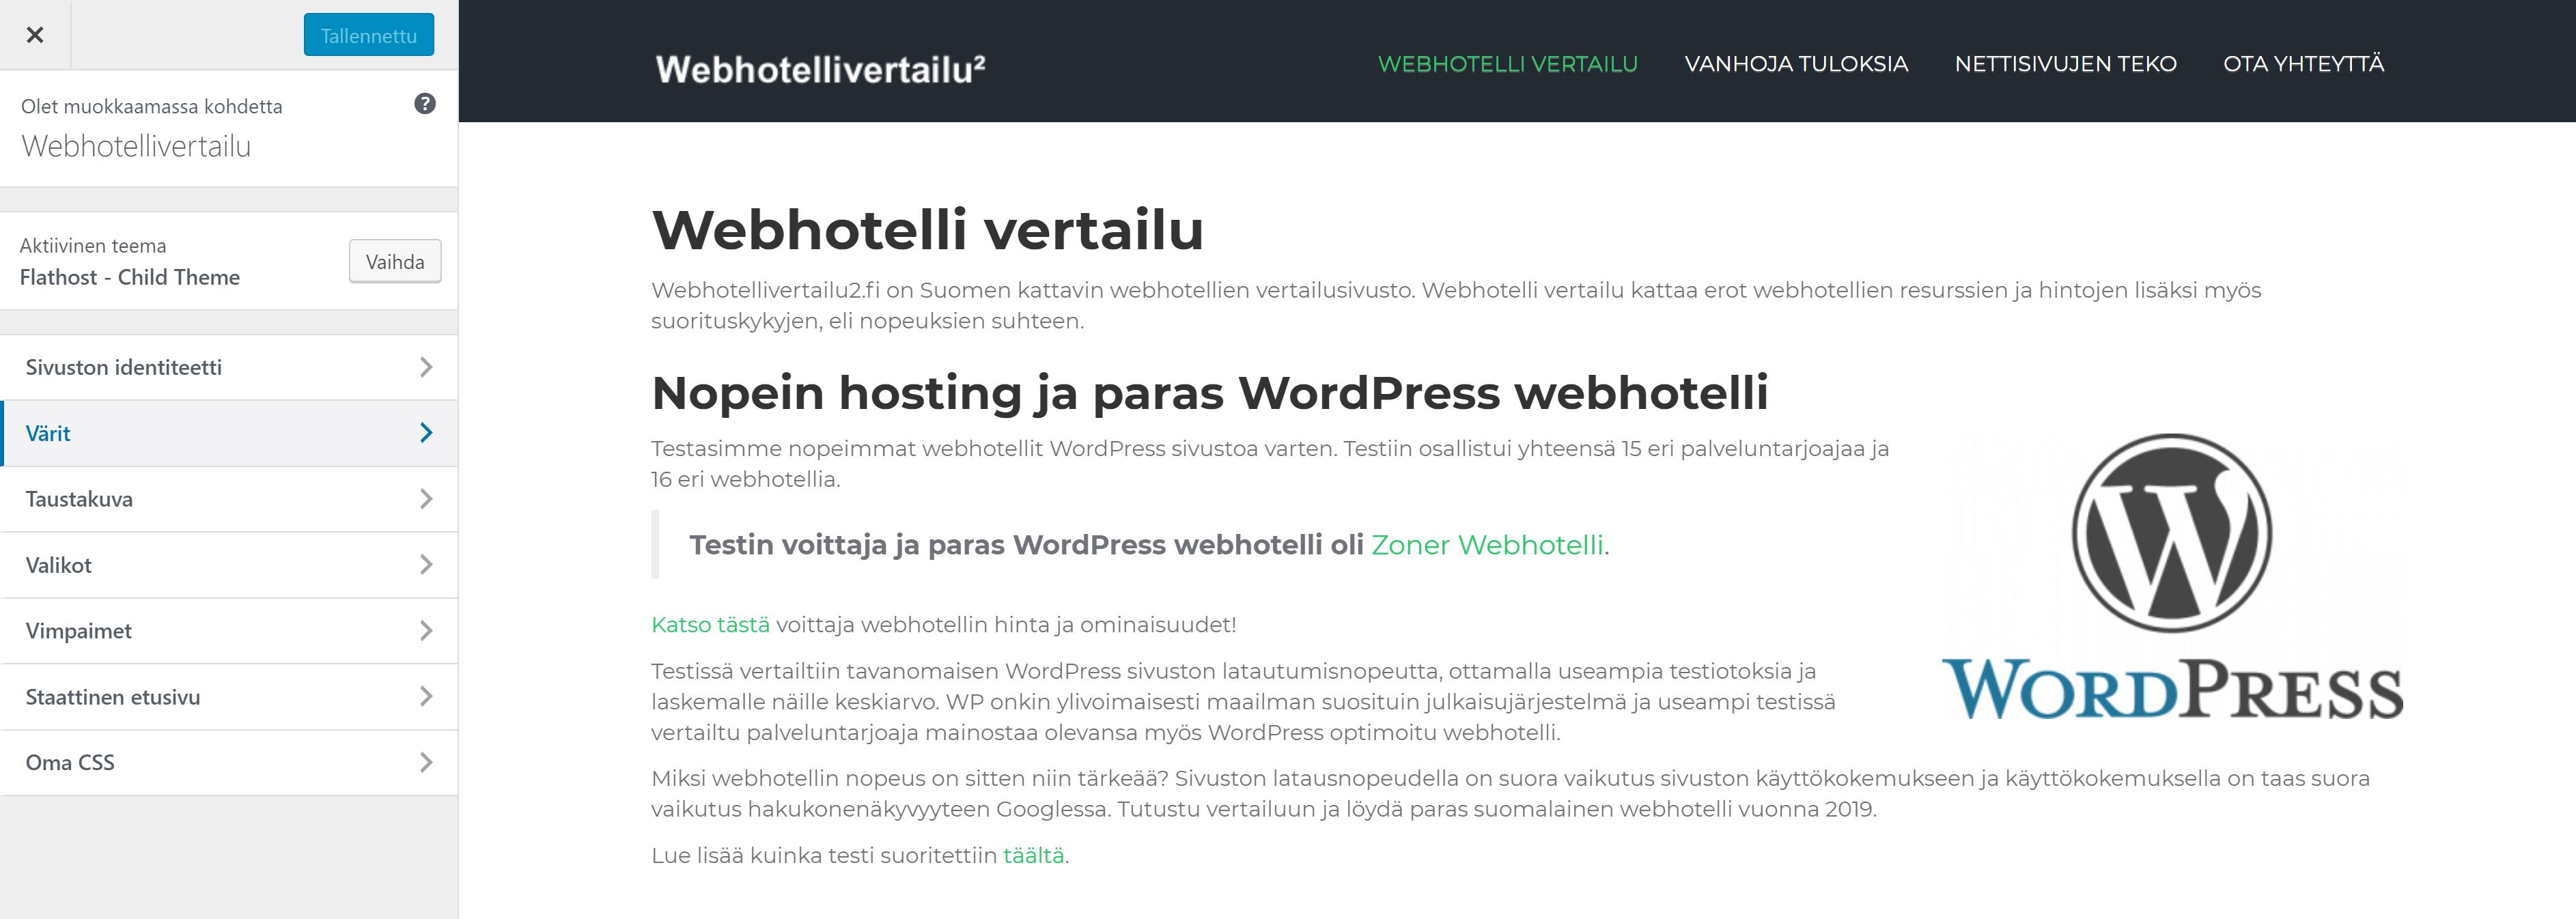 wordpress teeman muokkaus